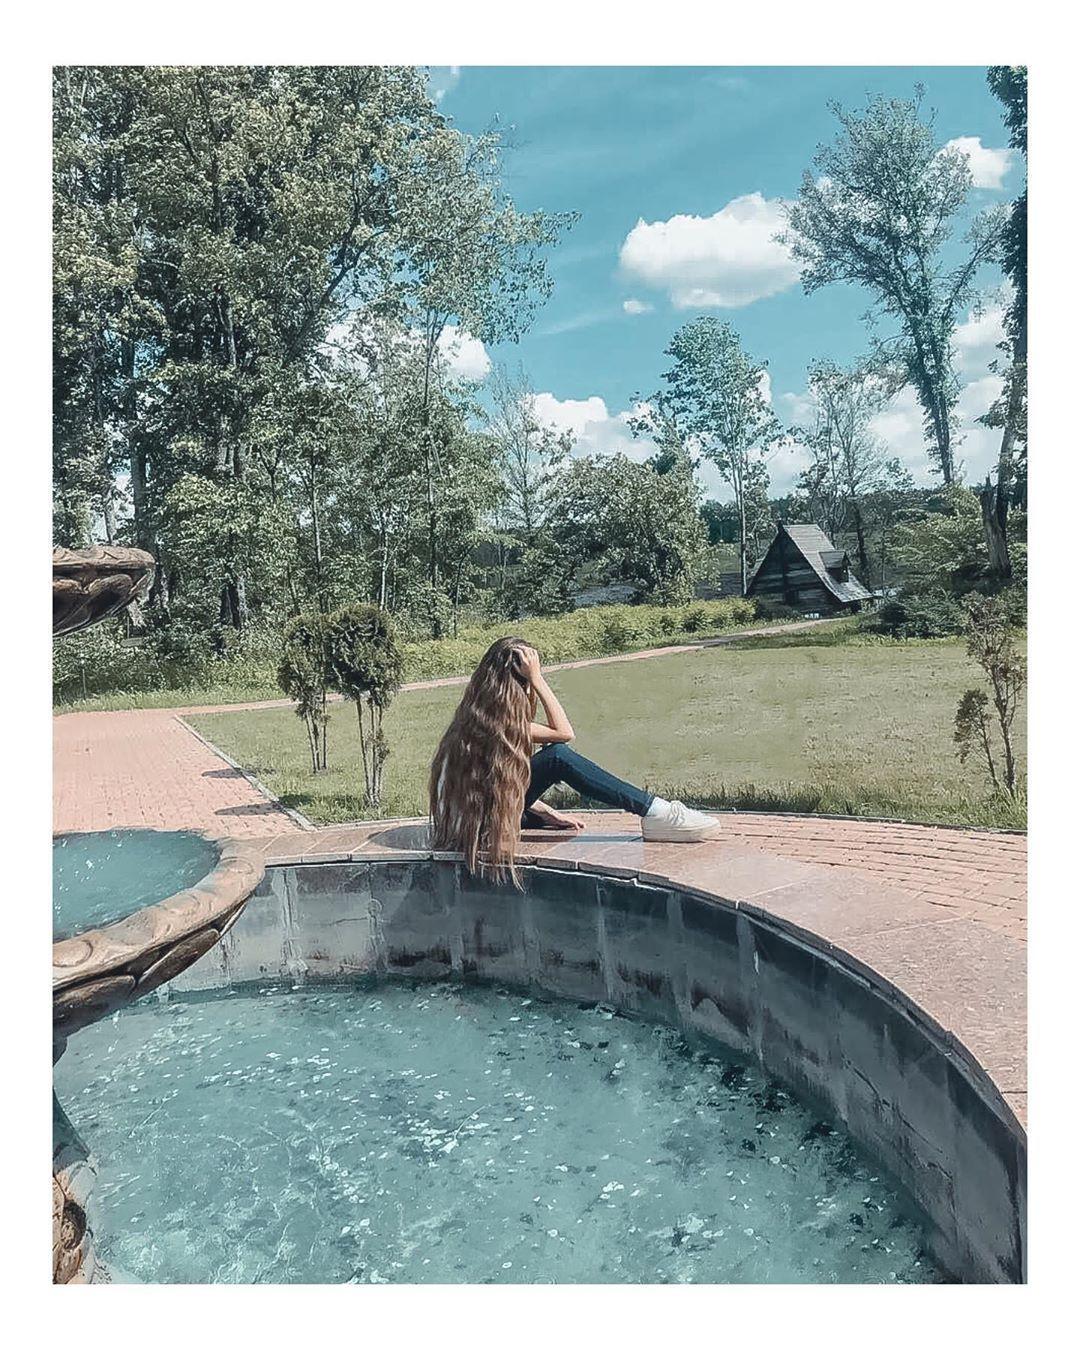 💦Воспоминания 28.05.2019💦 ☀️Фотограф @__melissa__maa☀️ • • •  #photography #summer  #photooftheday  #picoftheday  #amazing  #bestoftheday  #bestofthebest  #instagram  #instatag #instastyle  #instapic  #mood #instamood #instago #instagood #instadaily #swag  #style  #myphoto #colorful